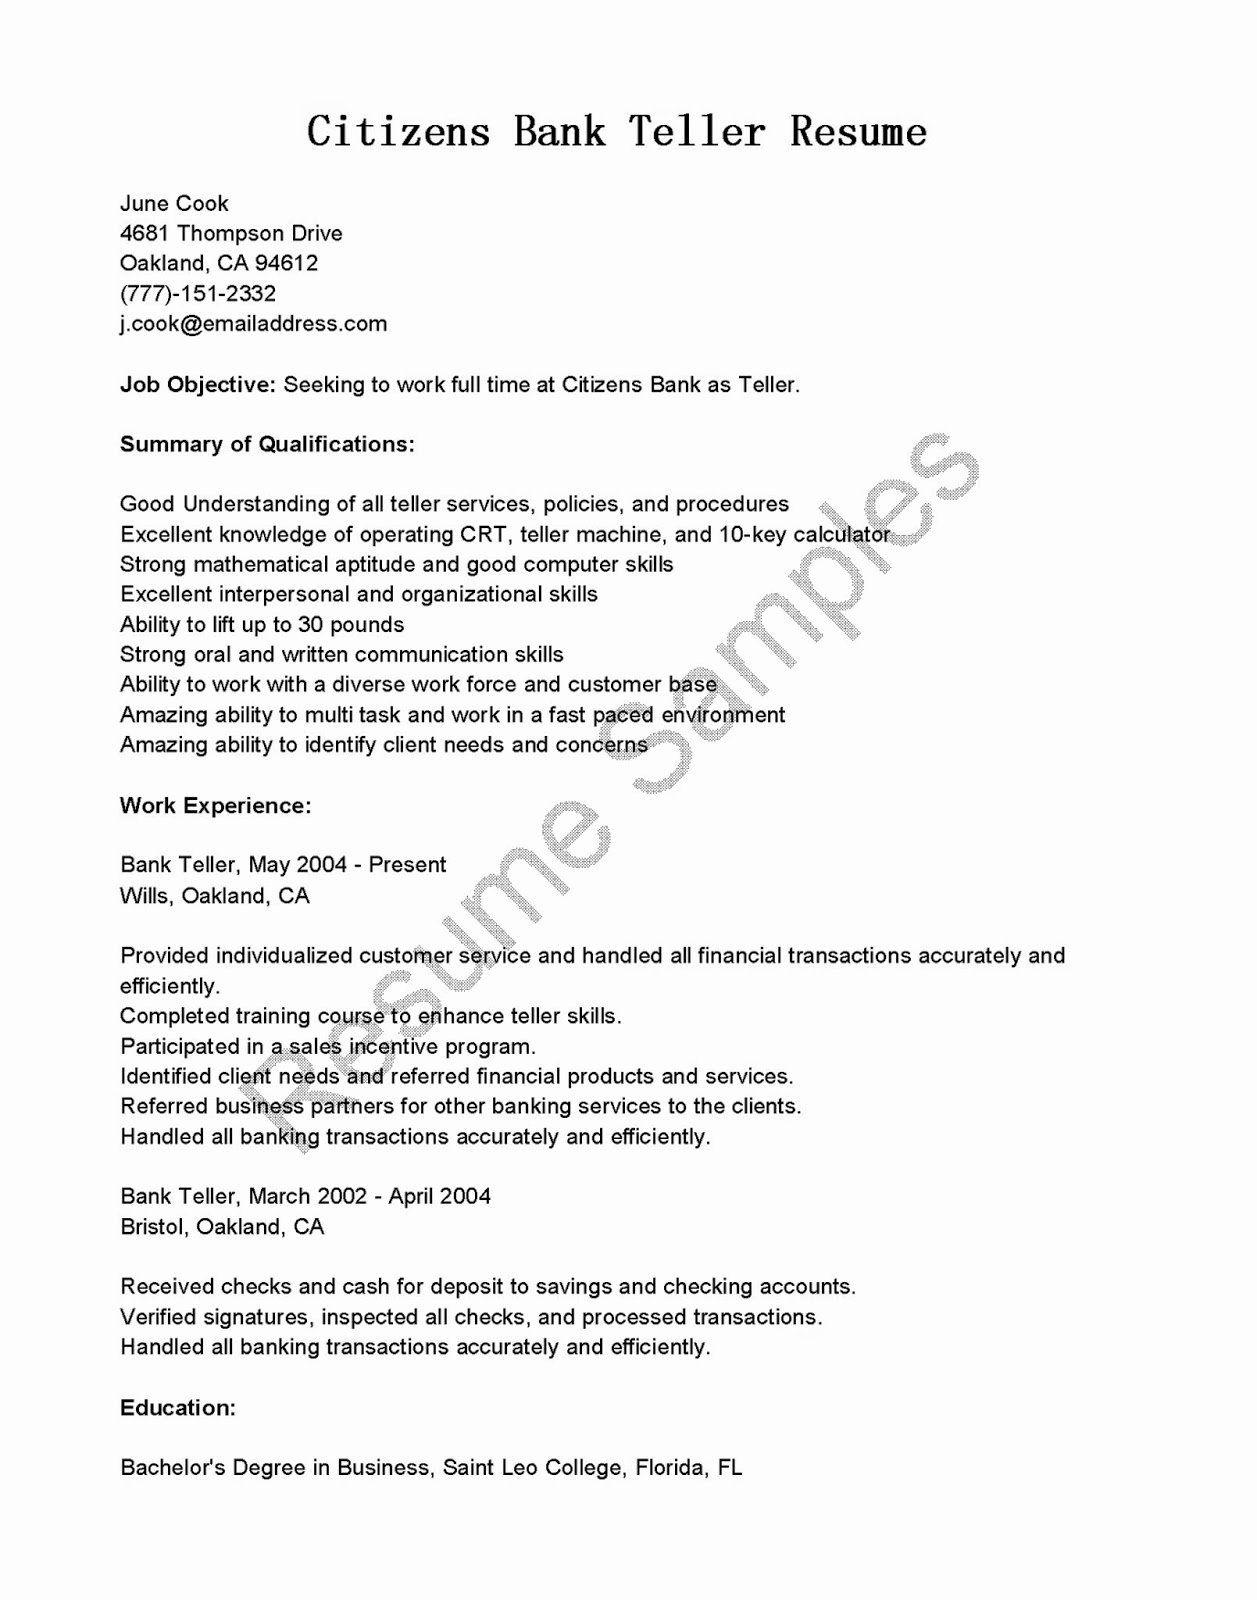 Bank teller duties resume new resume samples citizens bank